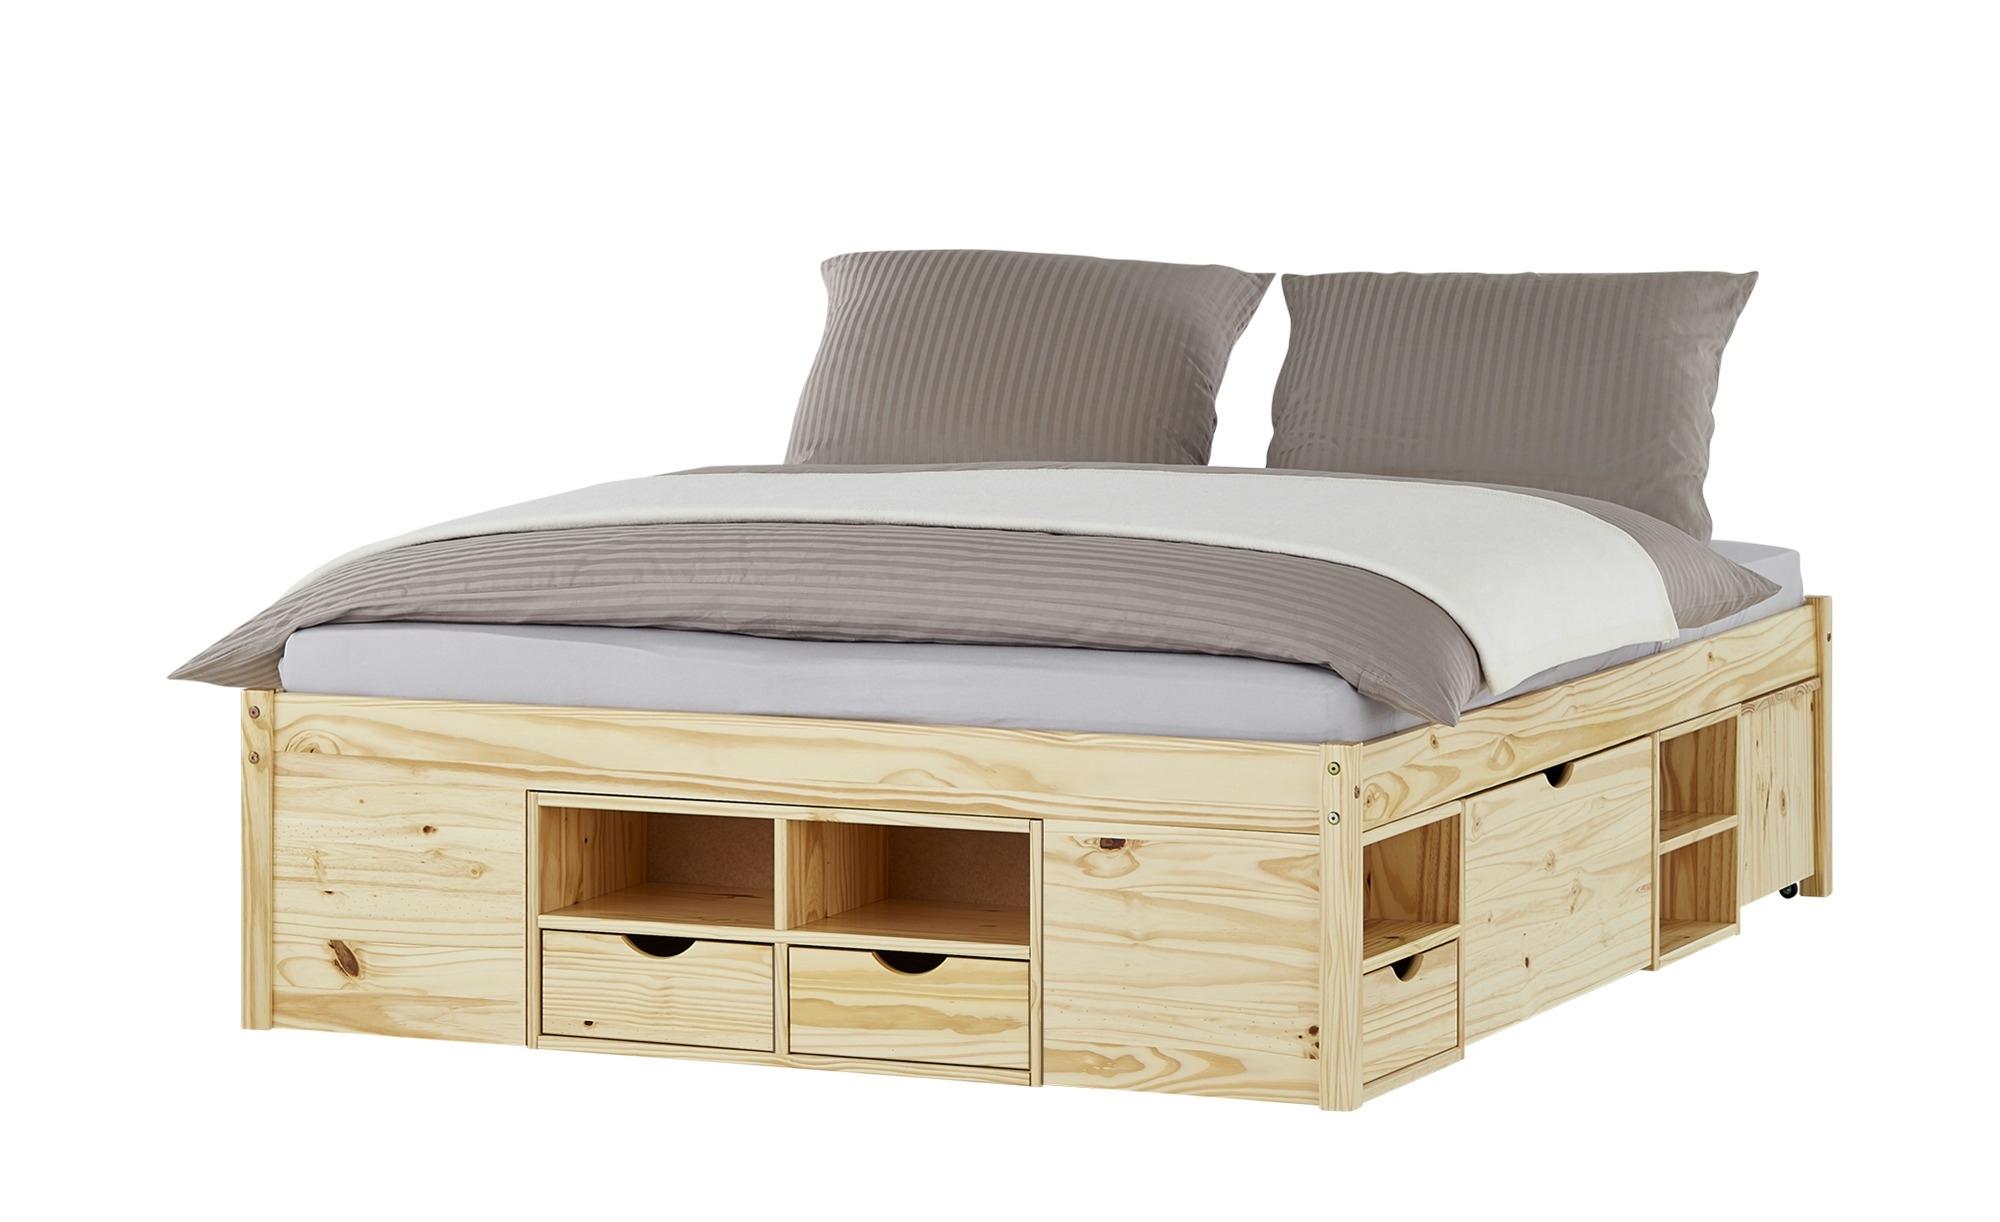 Funktionsbett - holzfarben - 166 cm - 47,5 cm - 209 cm - Betten > Bettgestelle - Möbel Kraft | Schlafzimmer > Betten > Funktionsbetten | Möbel Kraft